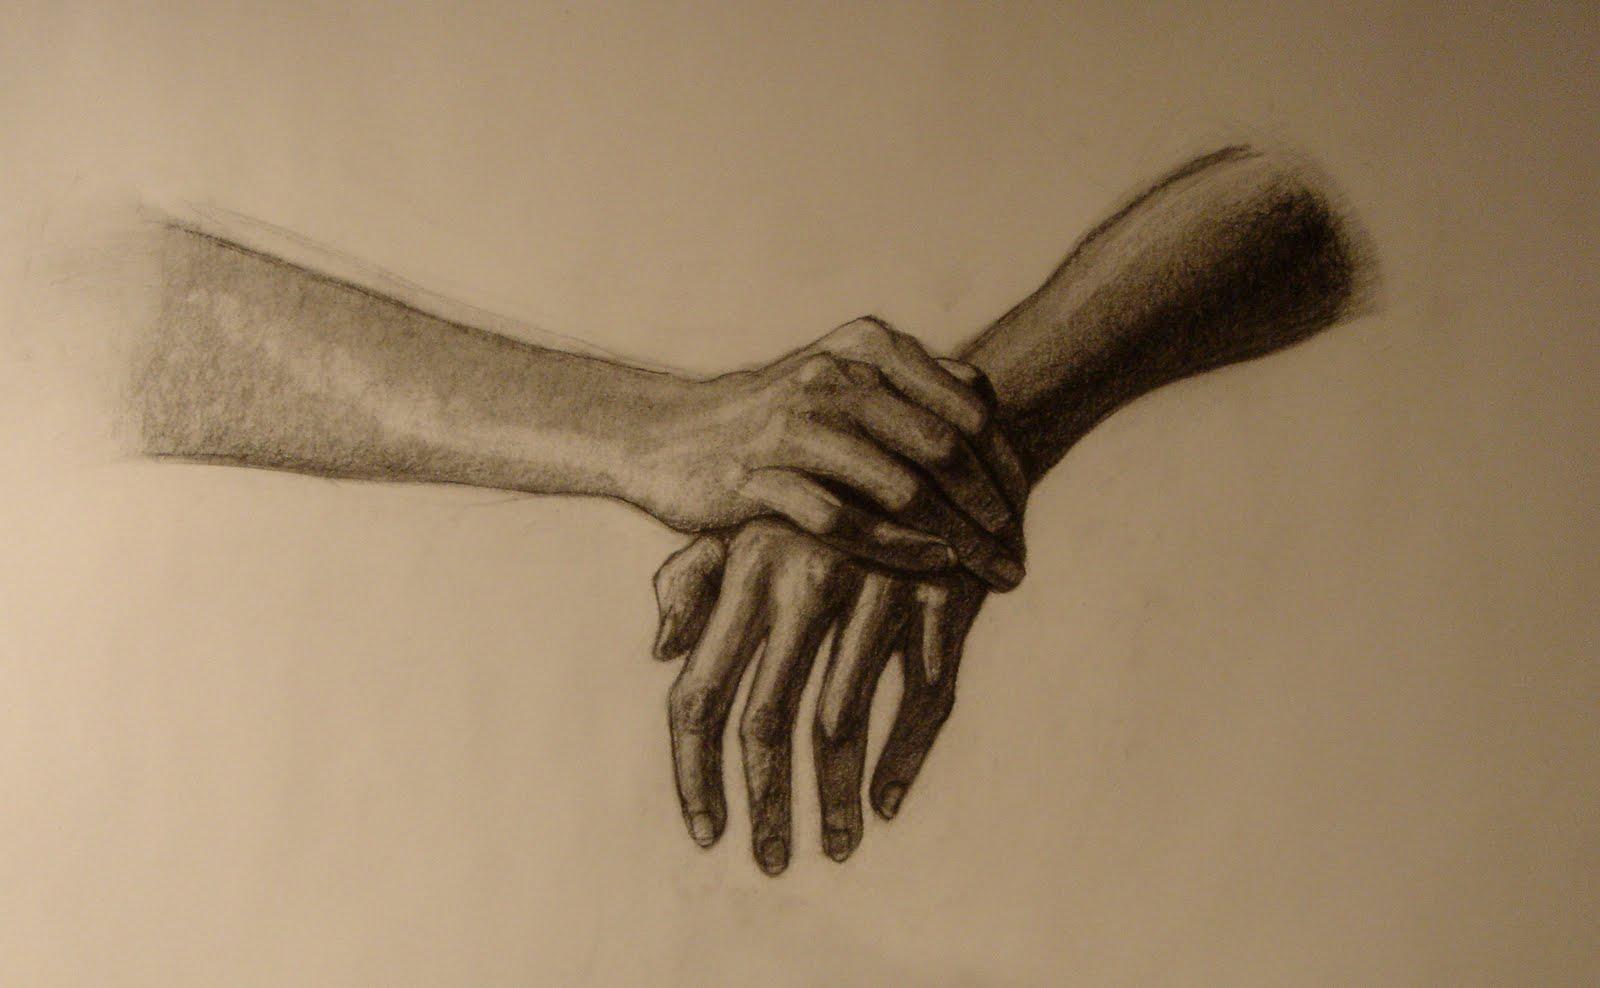 NikaWind Art Studios Hands Charcoal Drawings